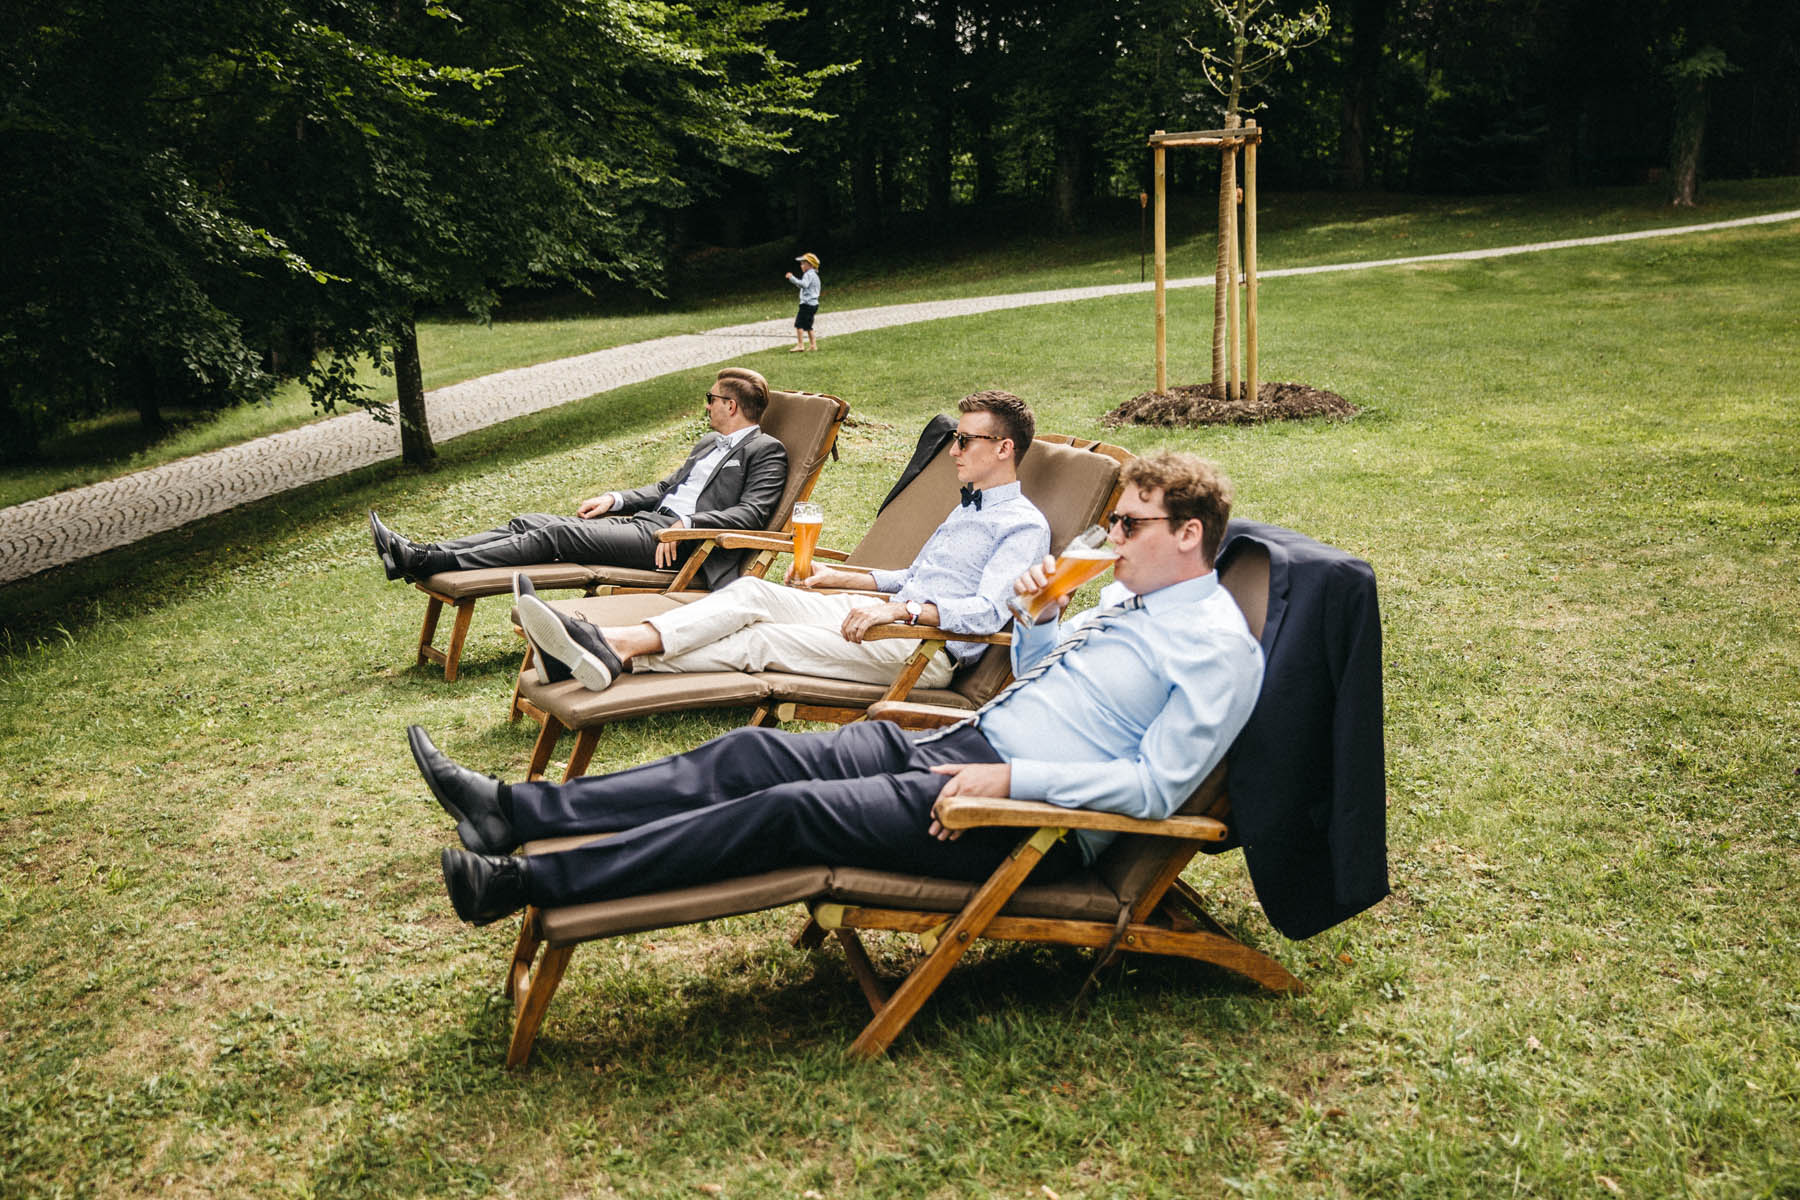 raissa simon fotografie hochzeit vintage starnberger see la villa 096 - Patricia + Maximilian